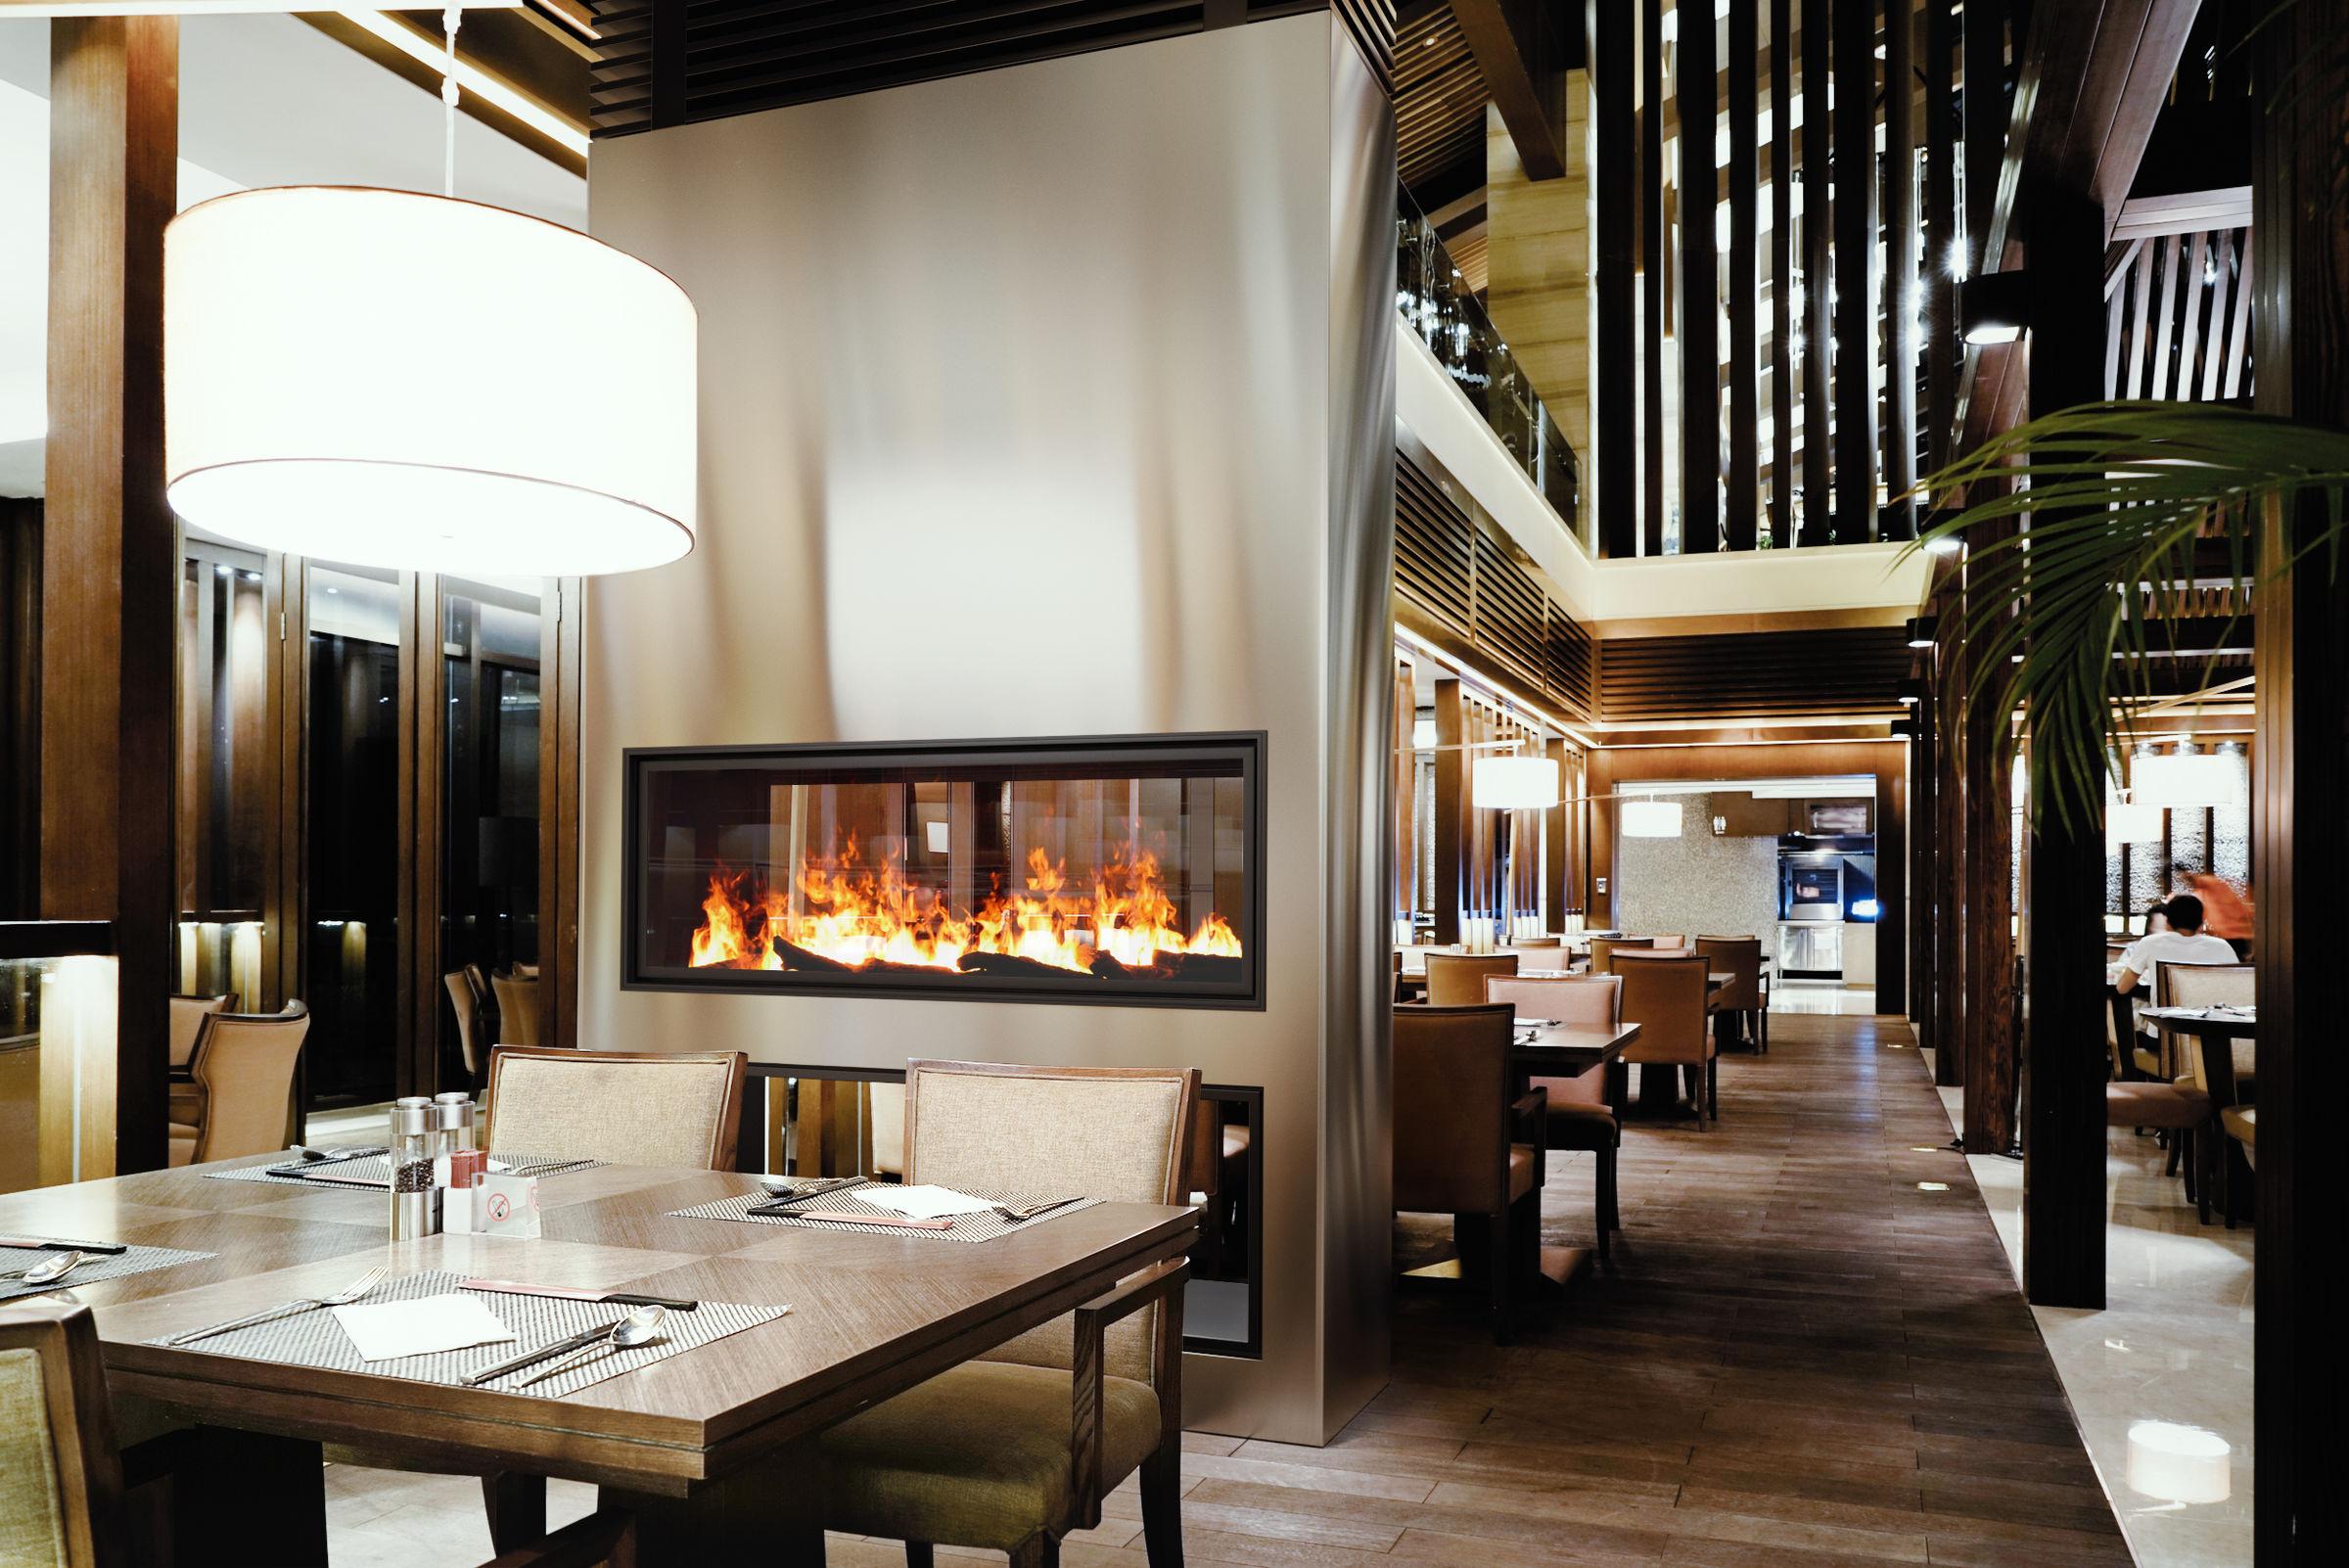 52 Inch See-Thru   Built-In Linear Vapor-Fire Fireplace